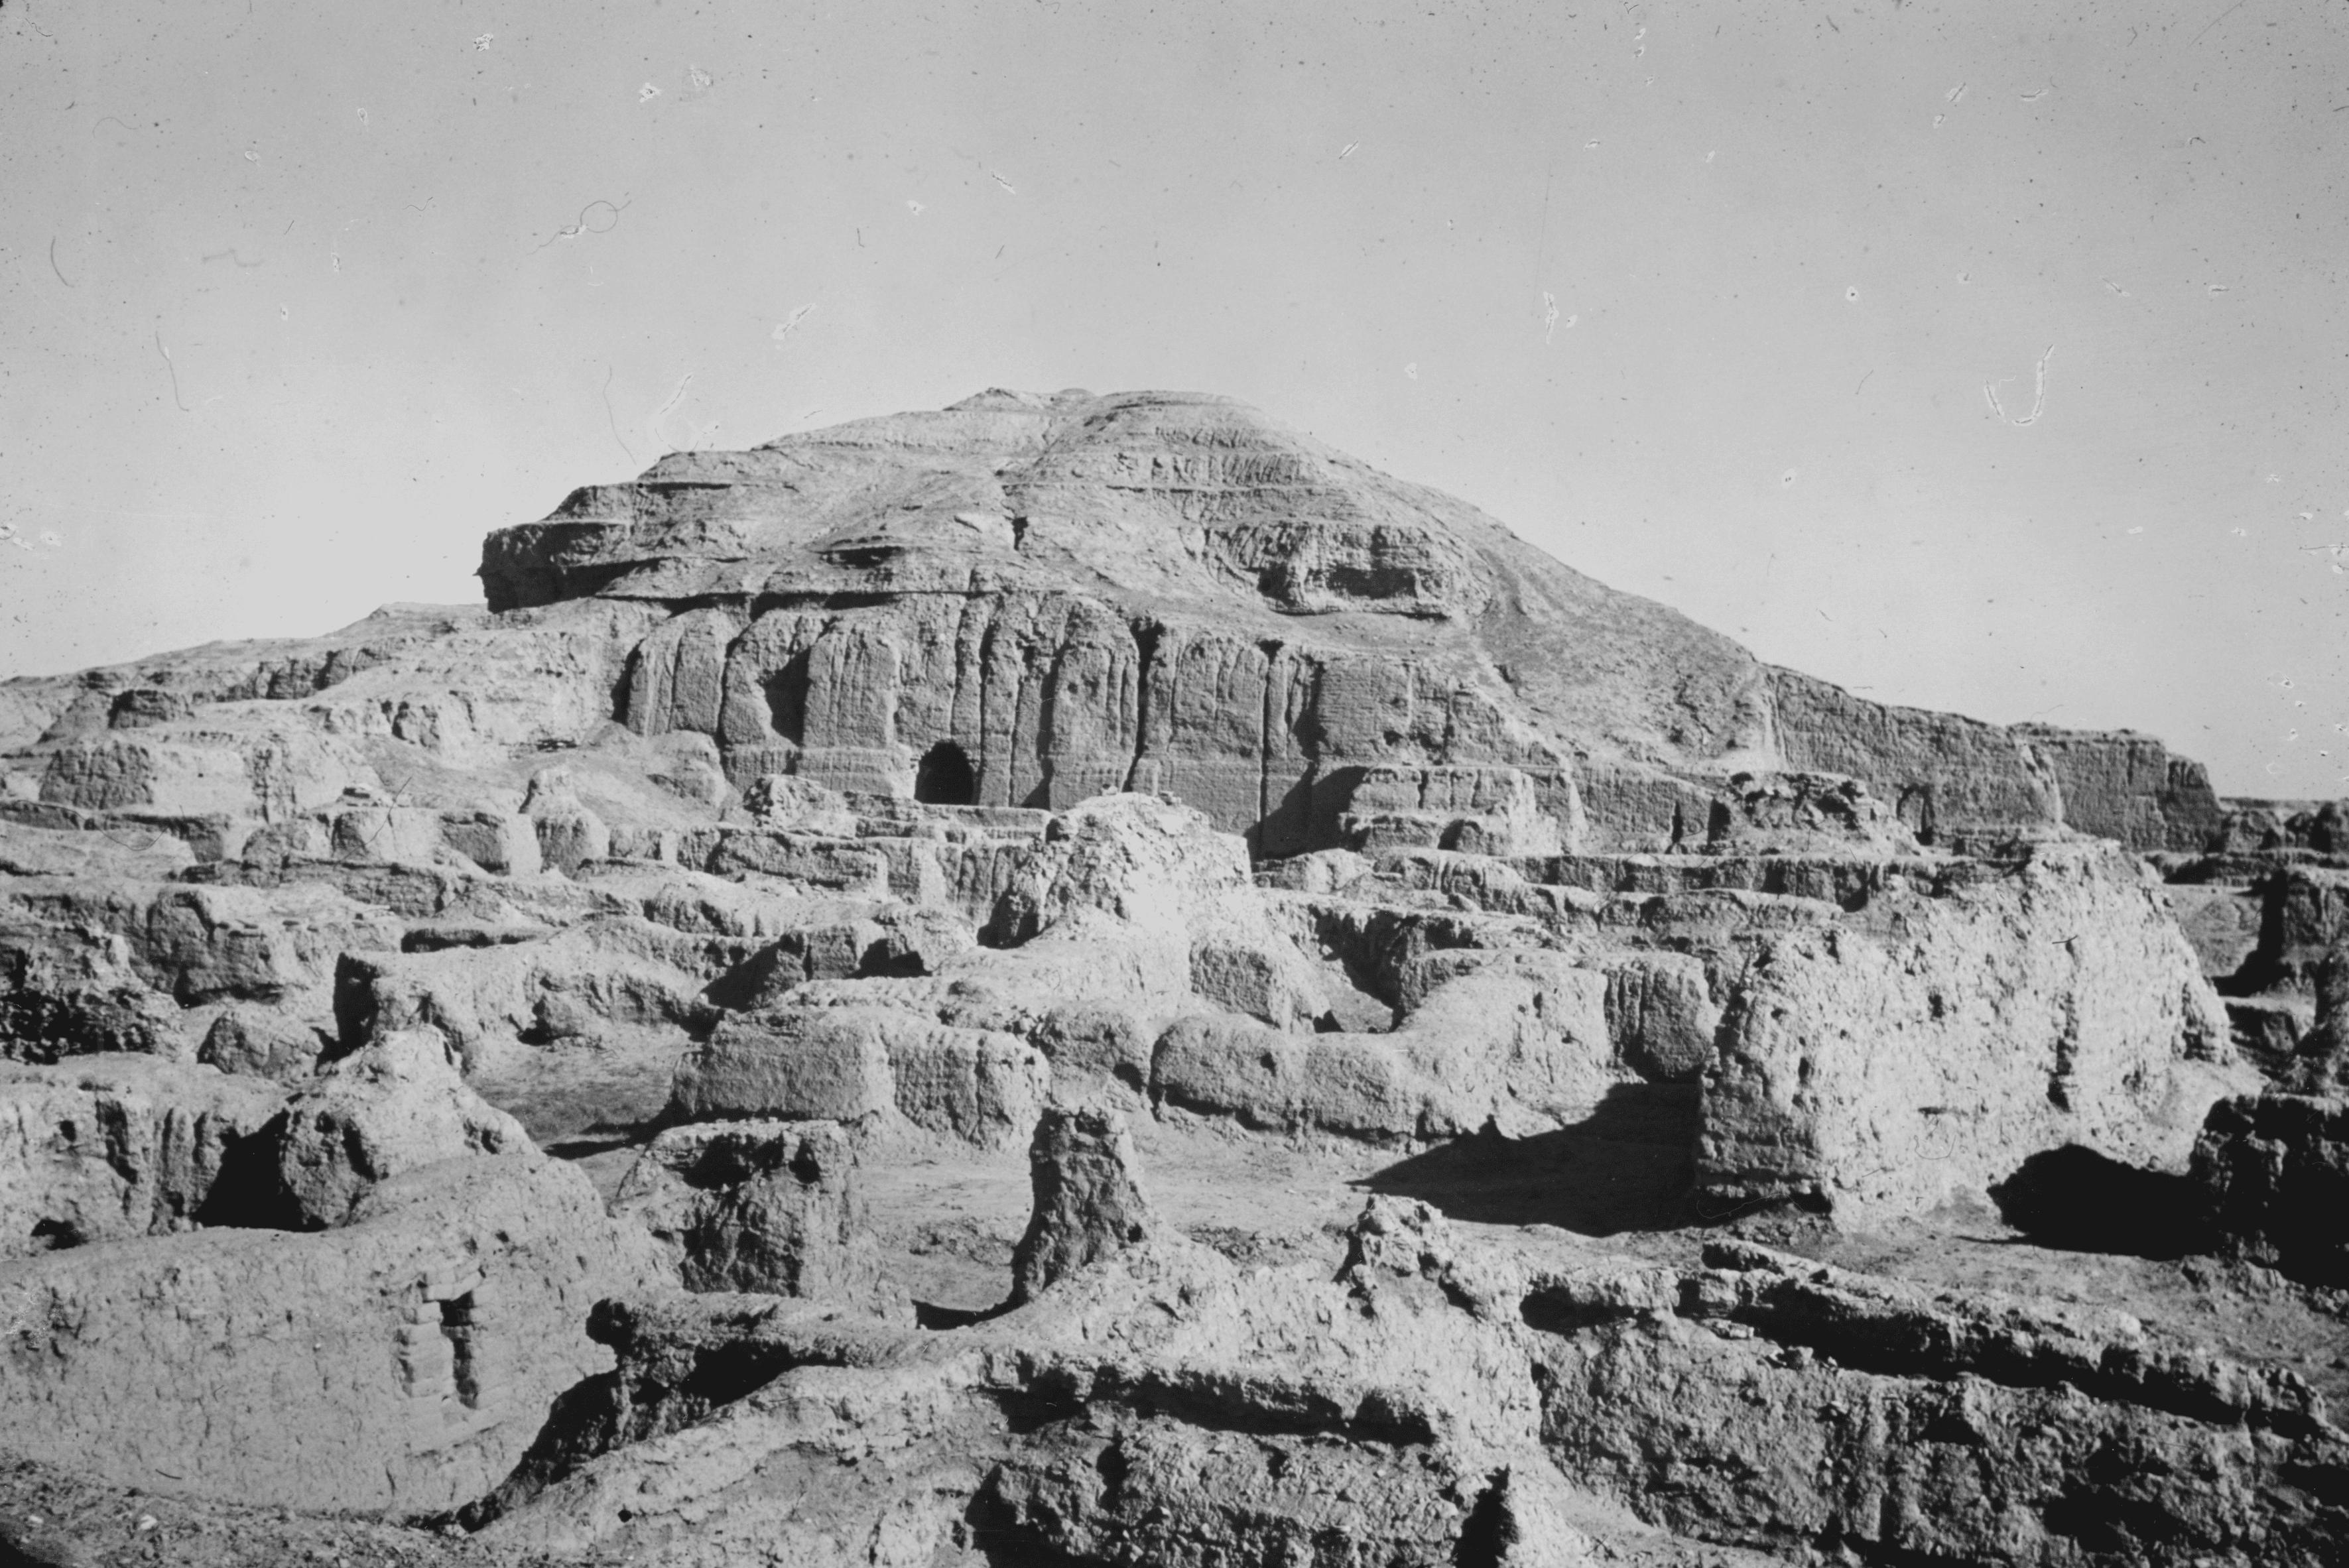 Ziggurat of Warka, Mesopotamia